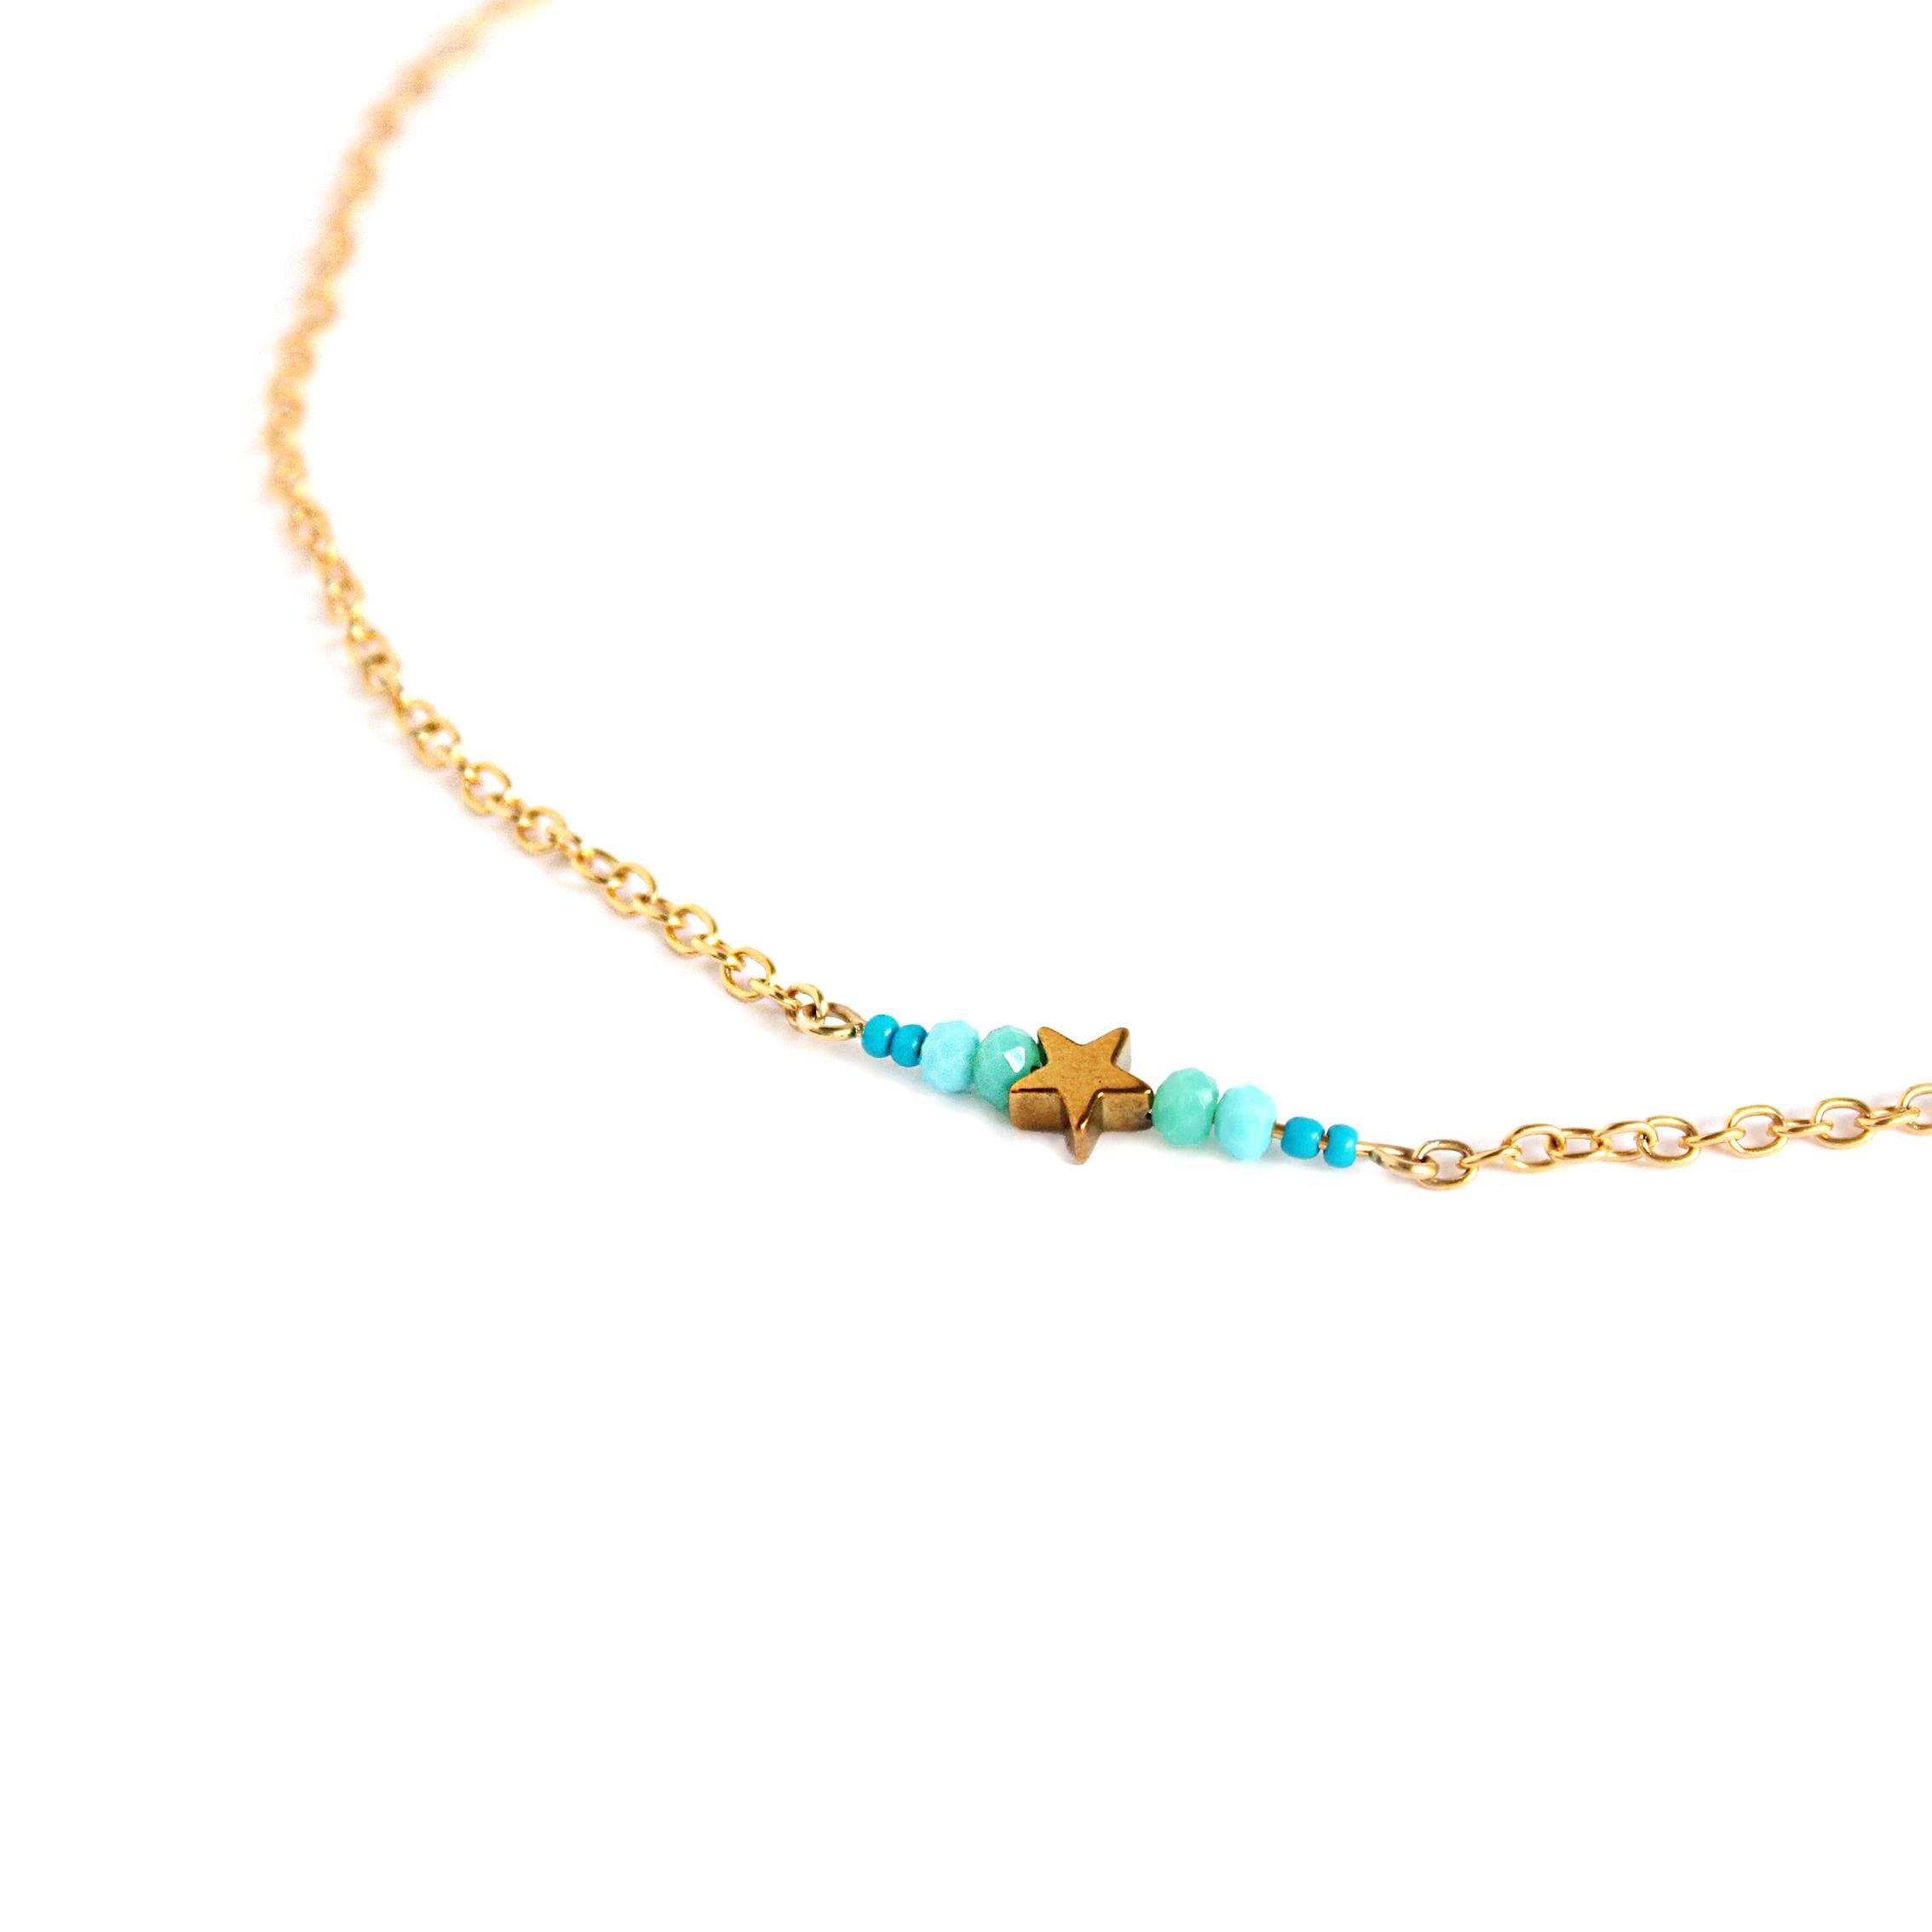 Detalle Collar con cadena de 2,3 mm de ancho Starfish